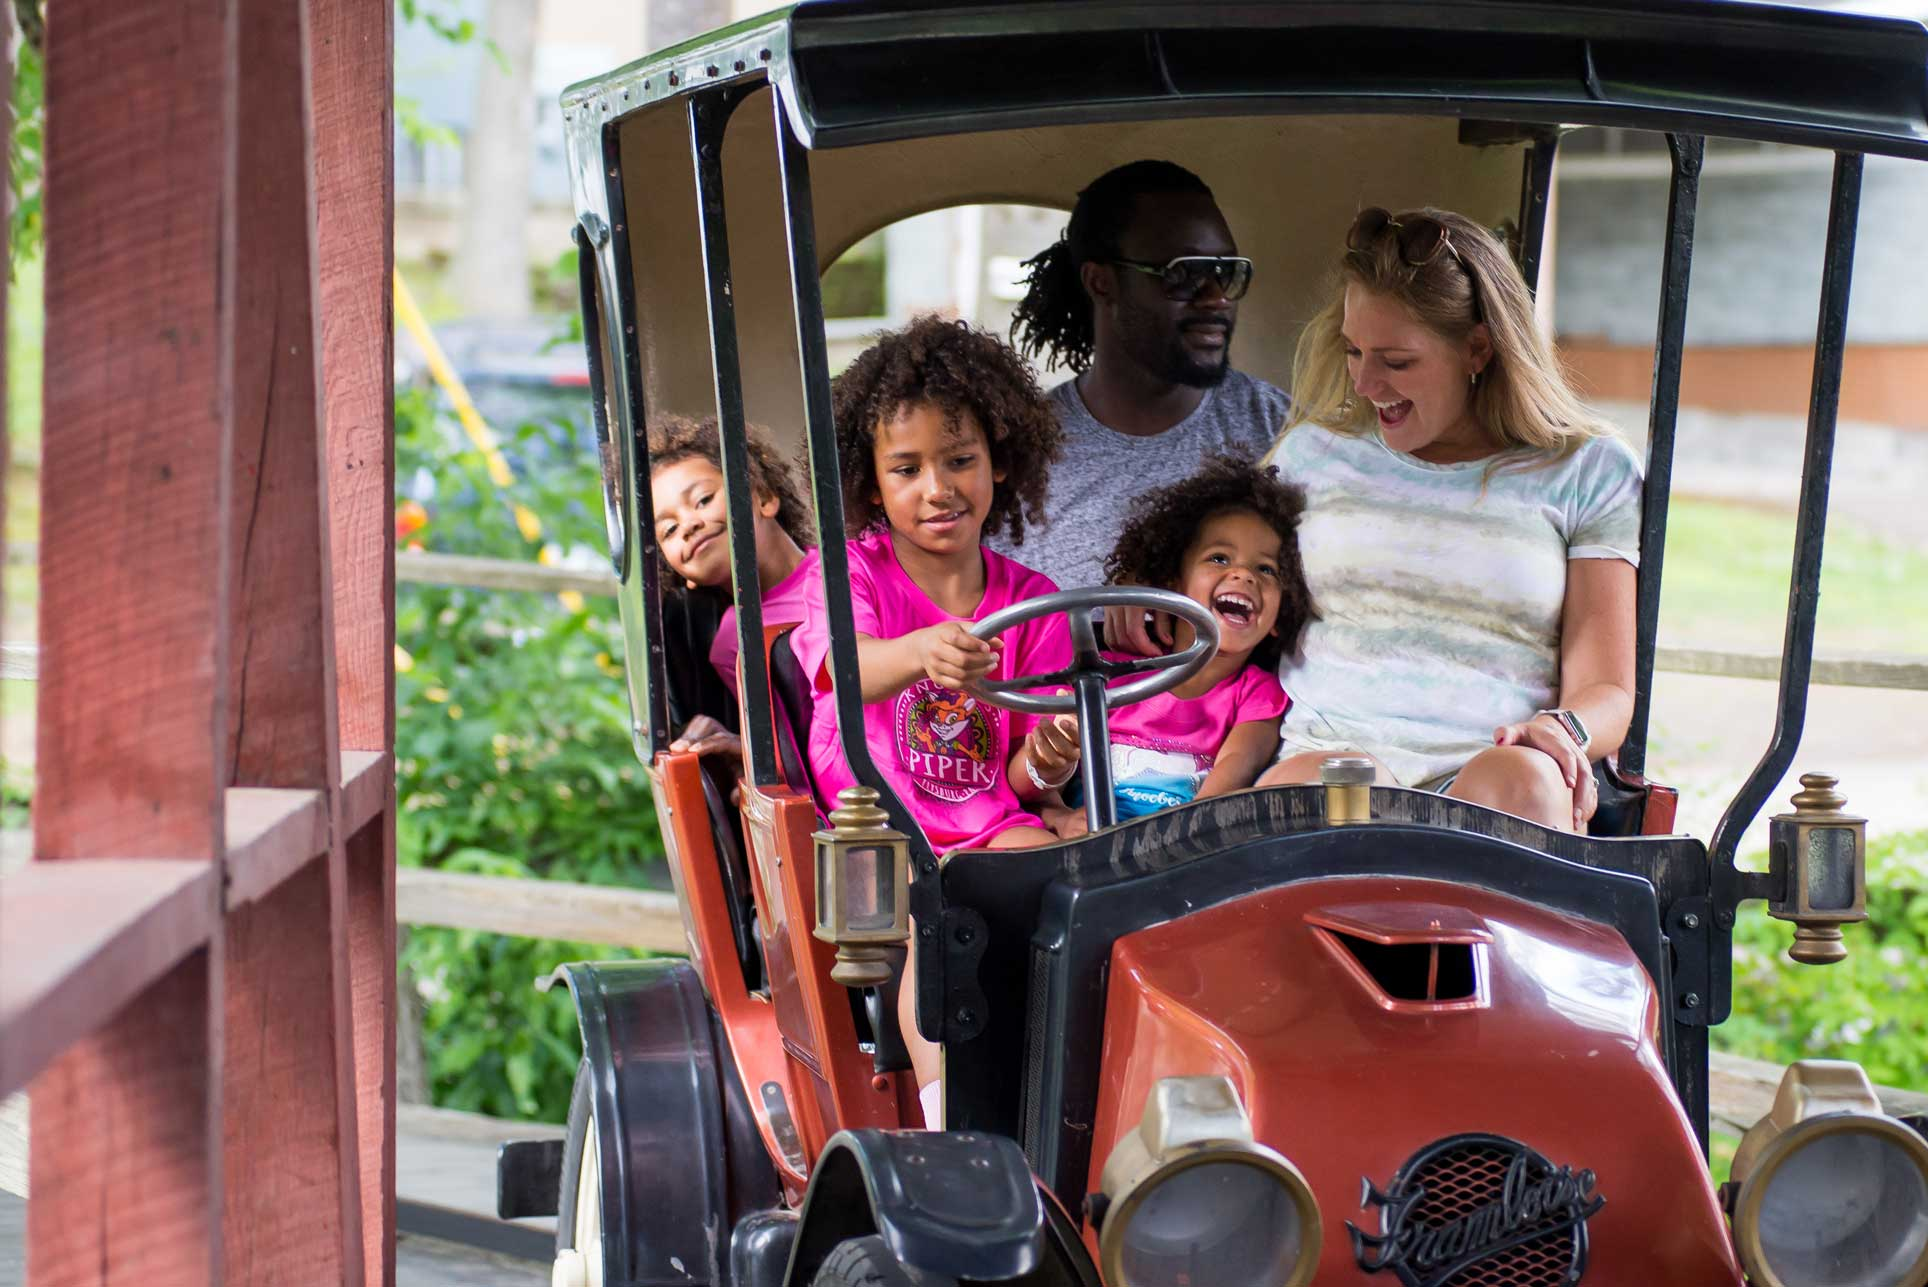 Knoebels family enjoying ride together